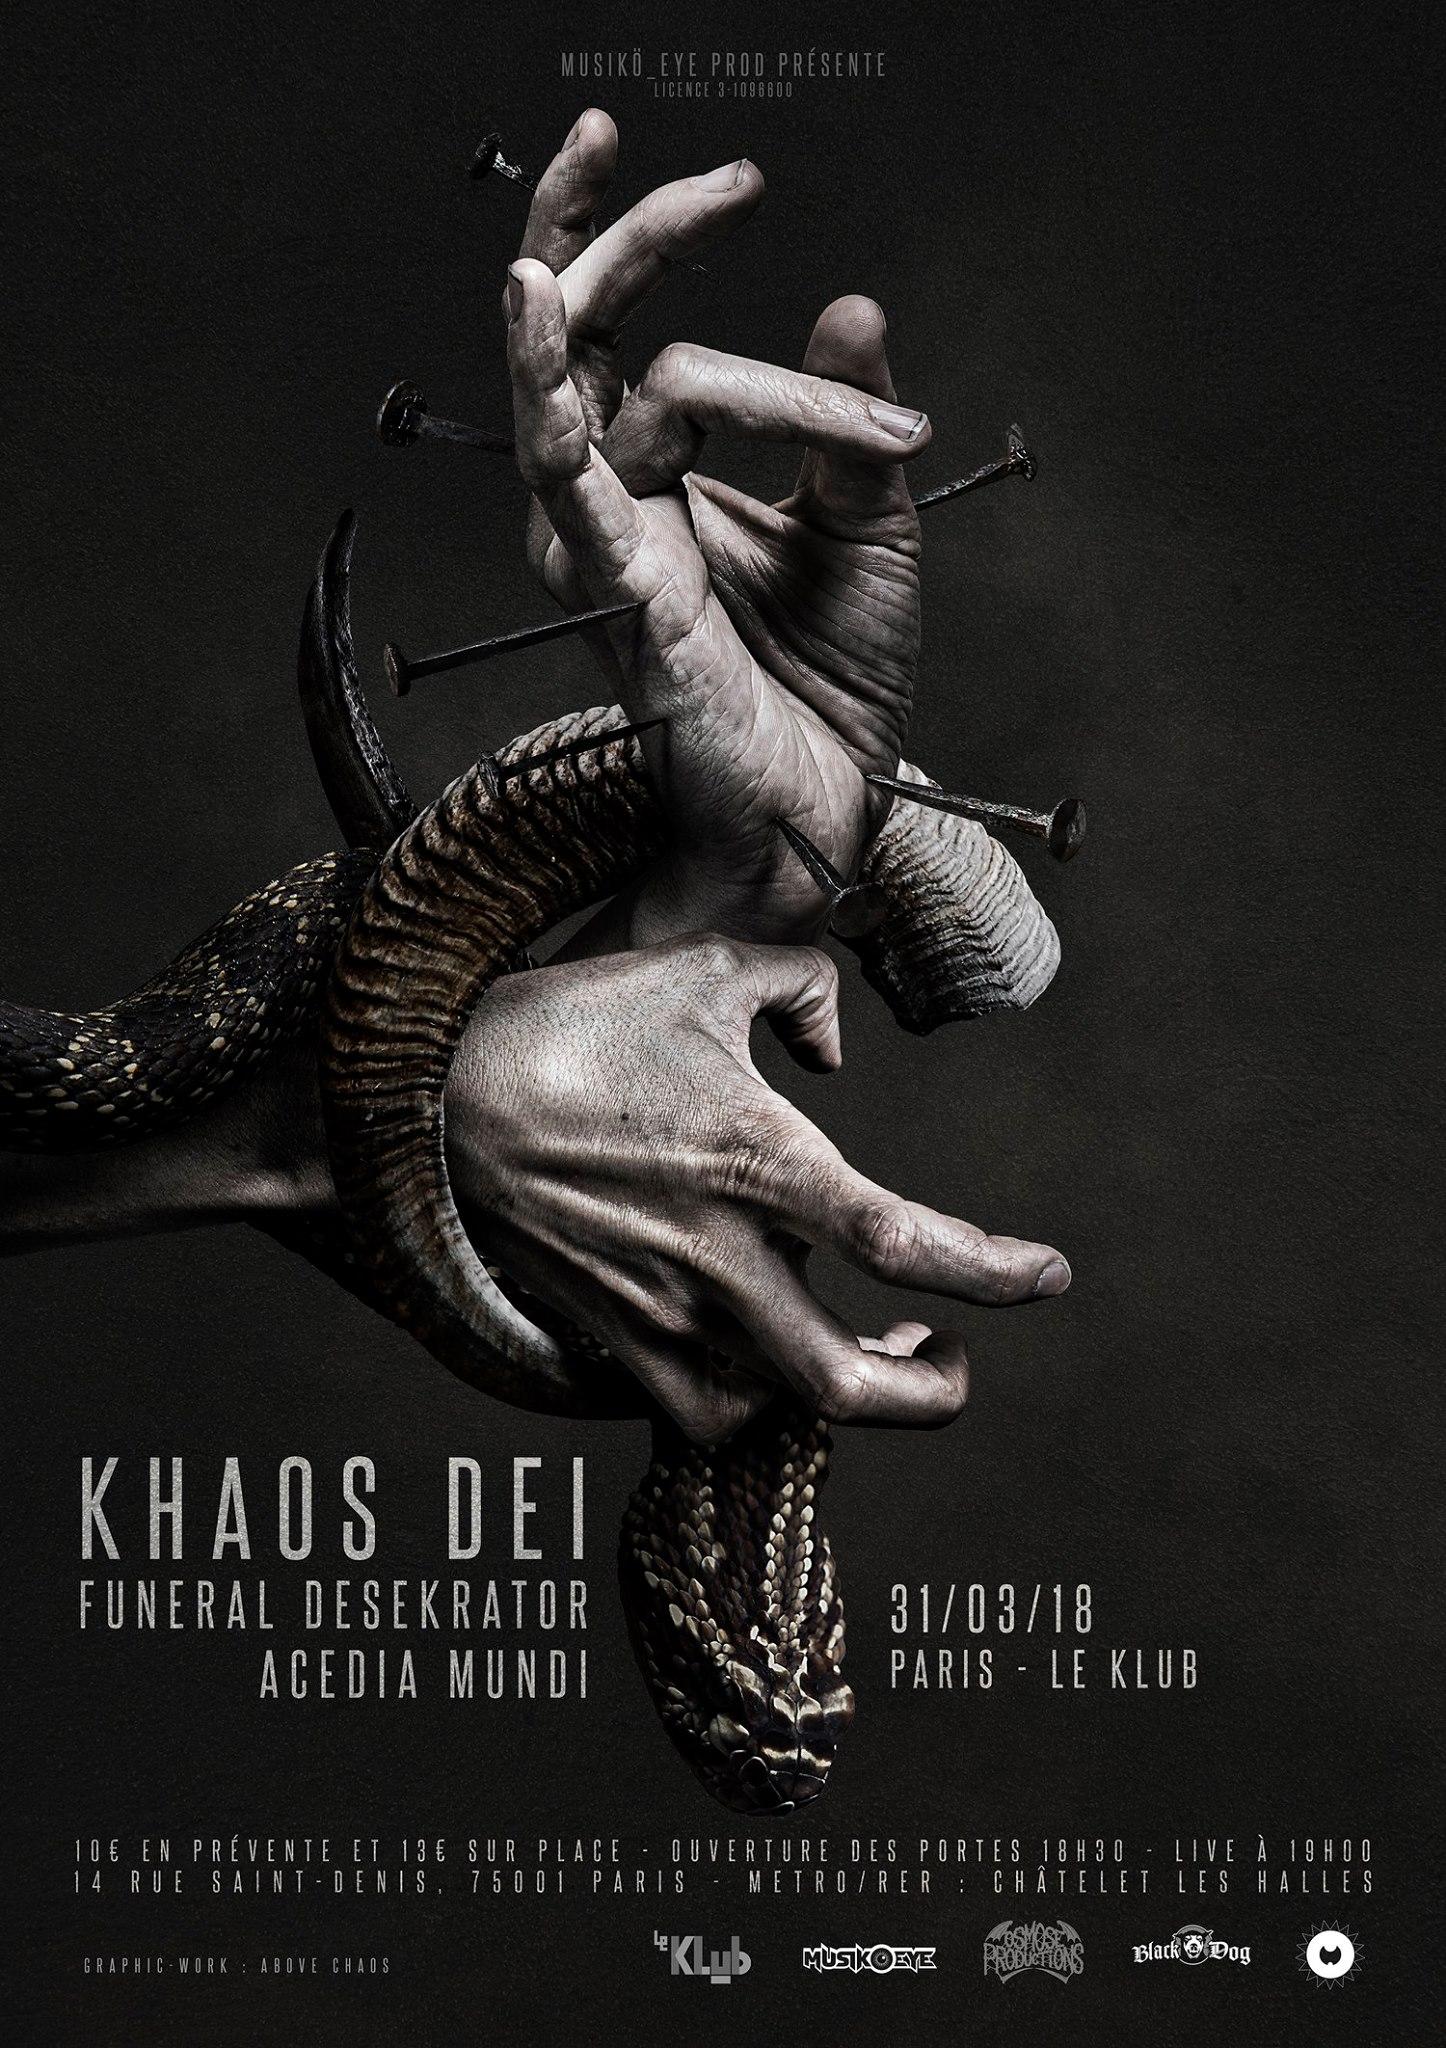 Khaos Dei + Funeral Desekrator + Acedia Mundi. ■ 31.03